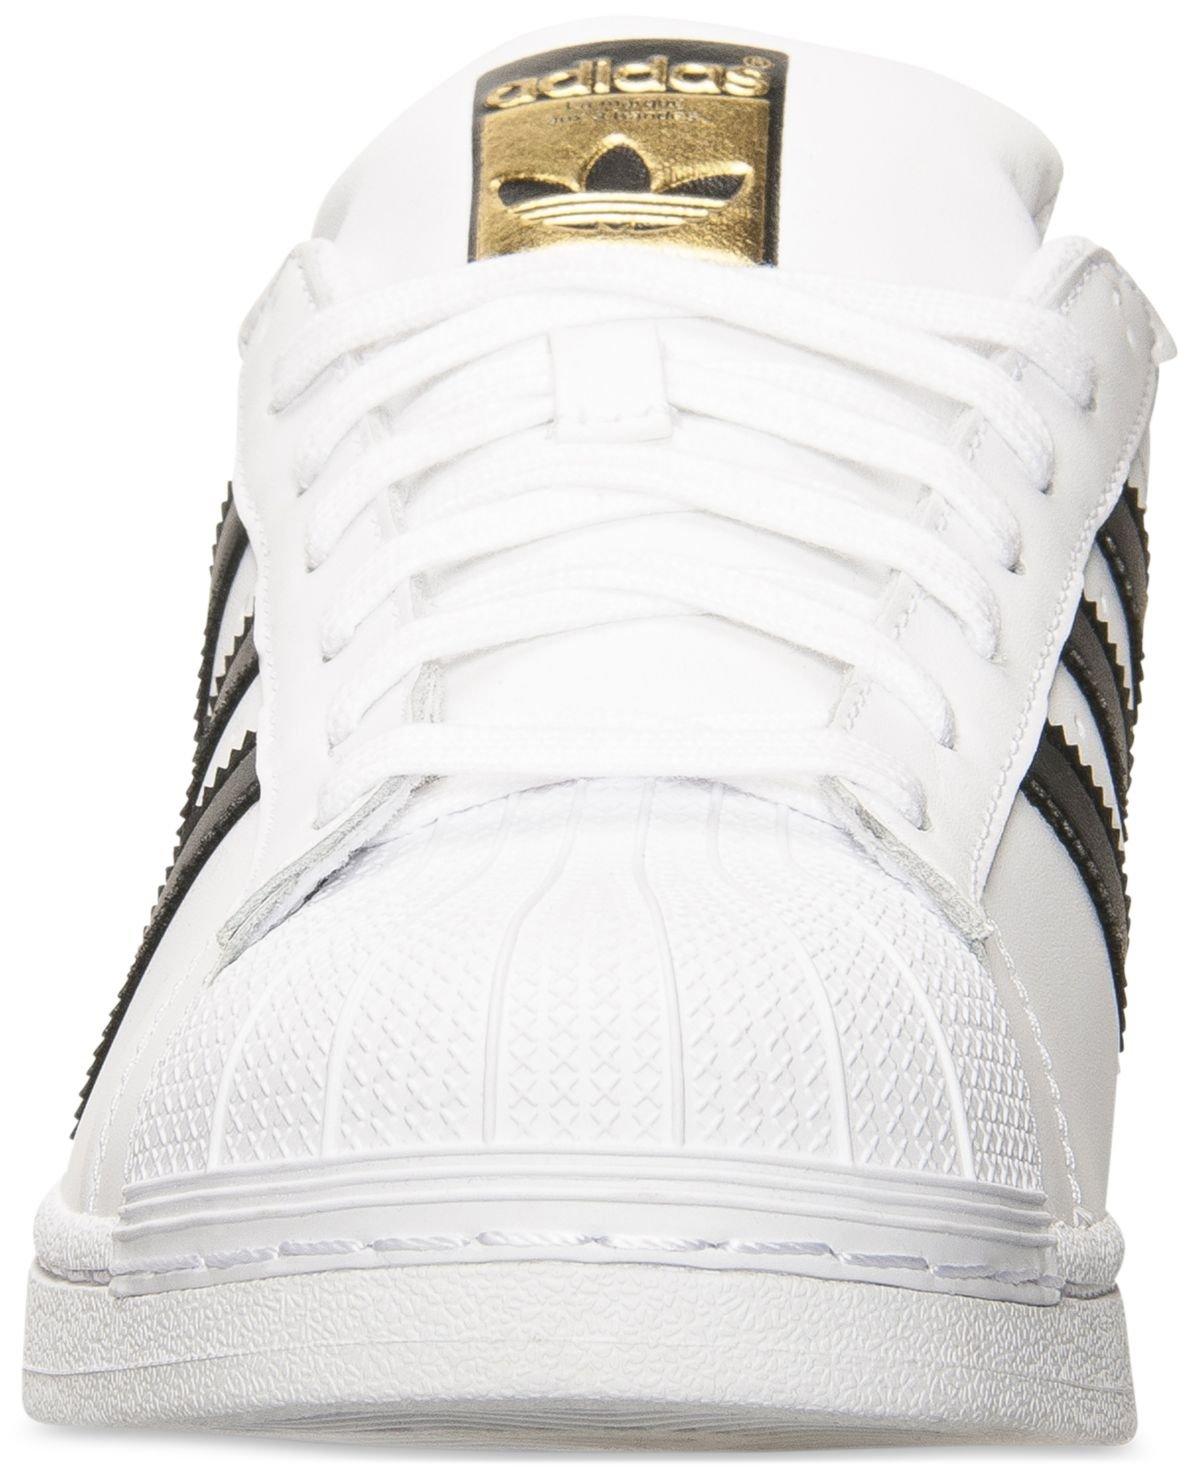 adidas Originals Men's Superstar Casual Sneaker, White/Core Black/White, 9.5 M US by adidas Originals (Image #3)